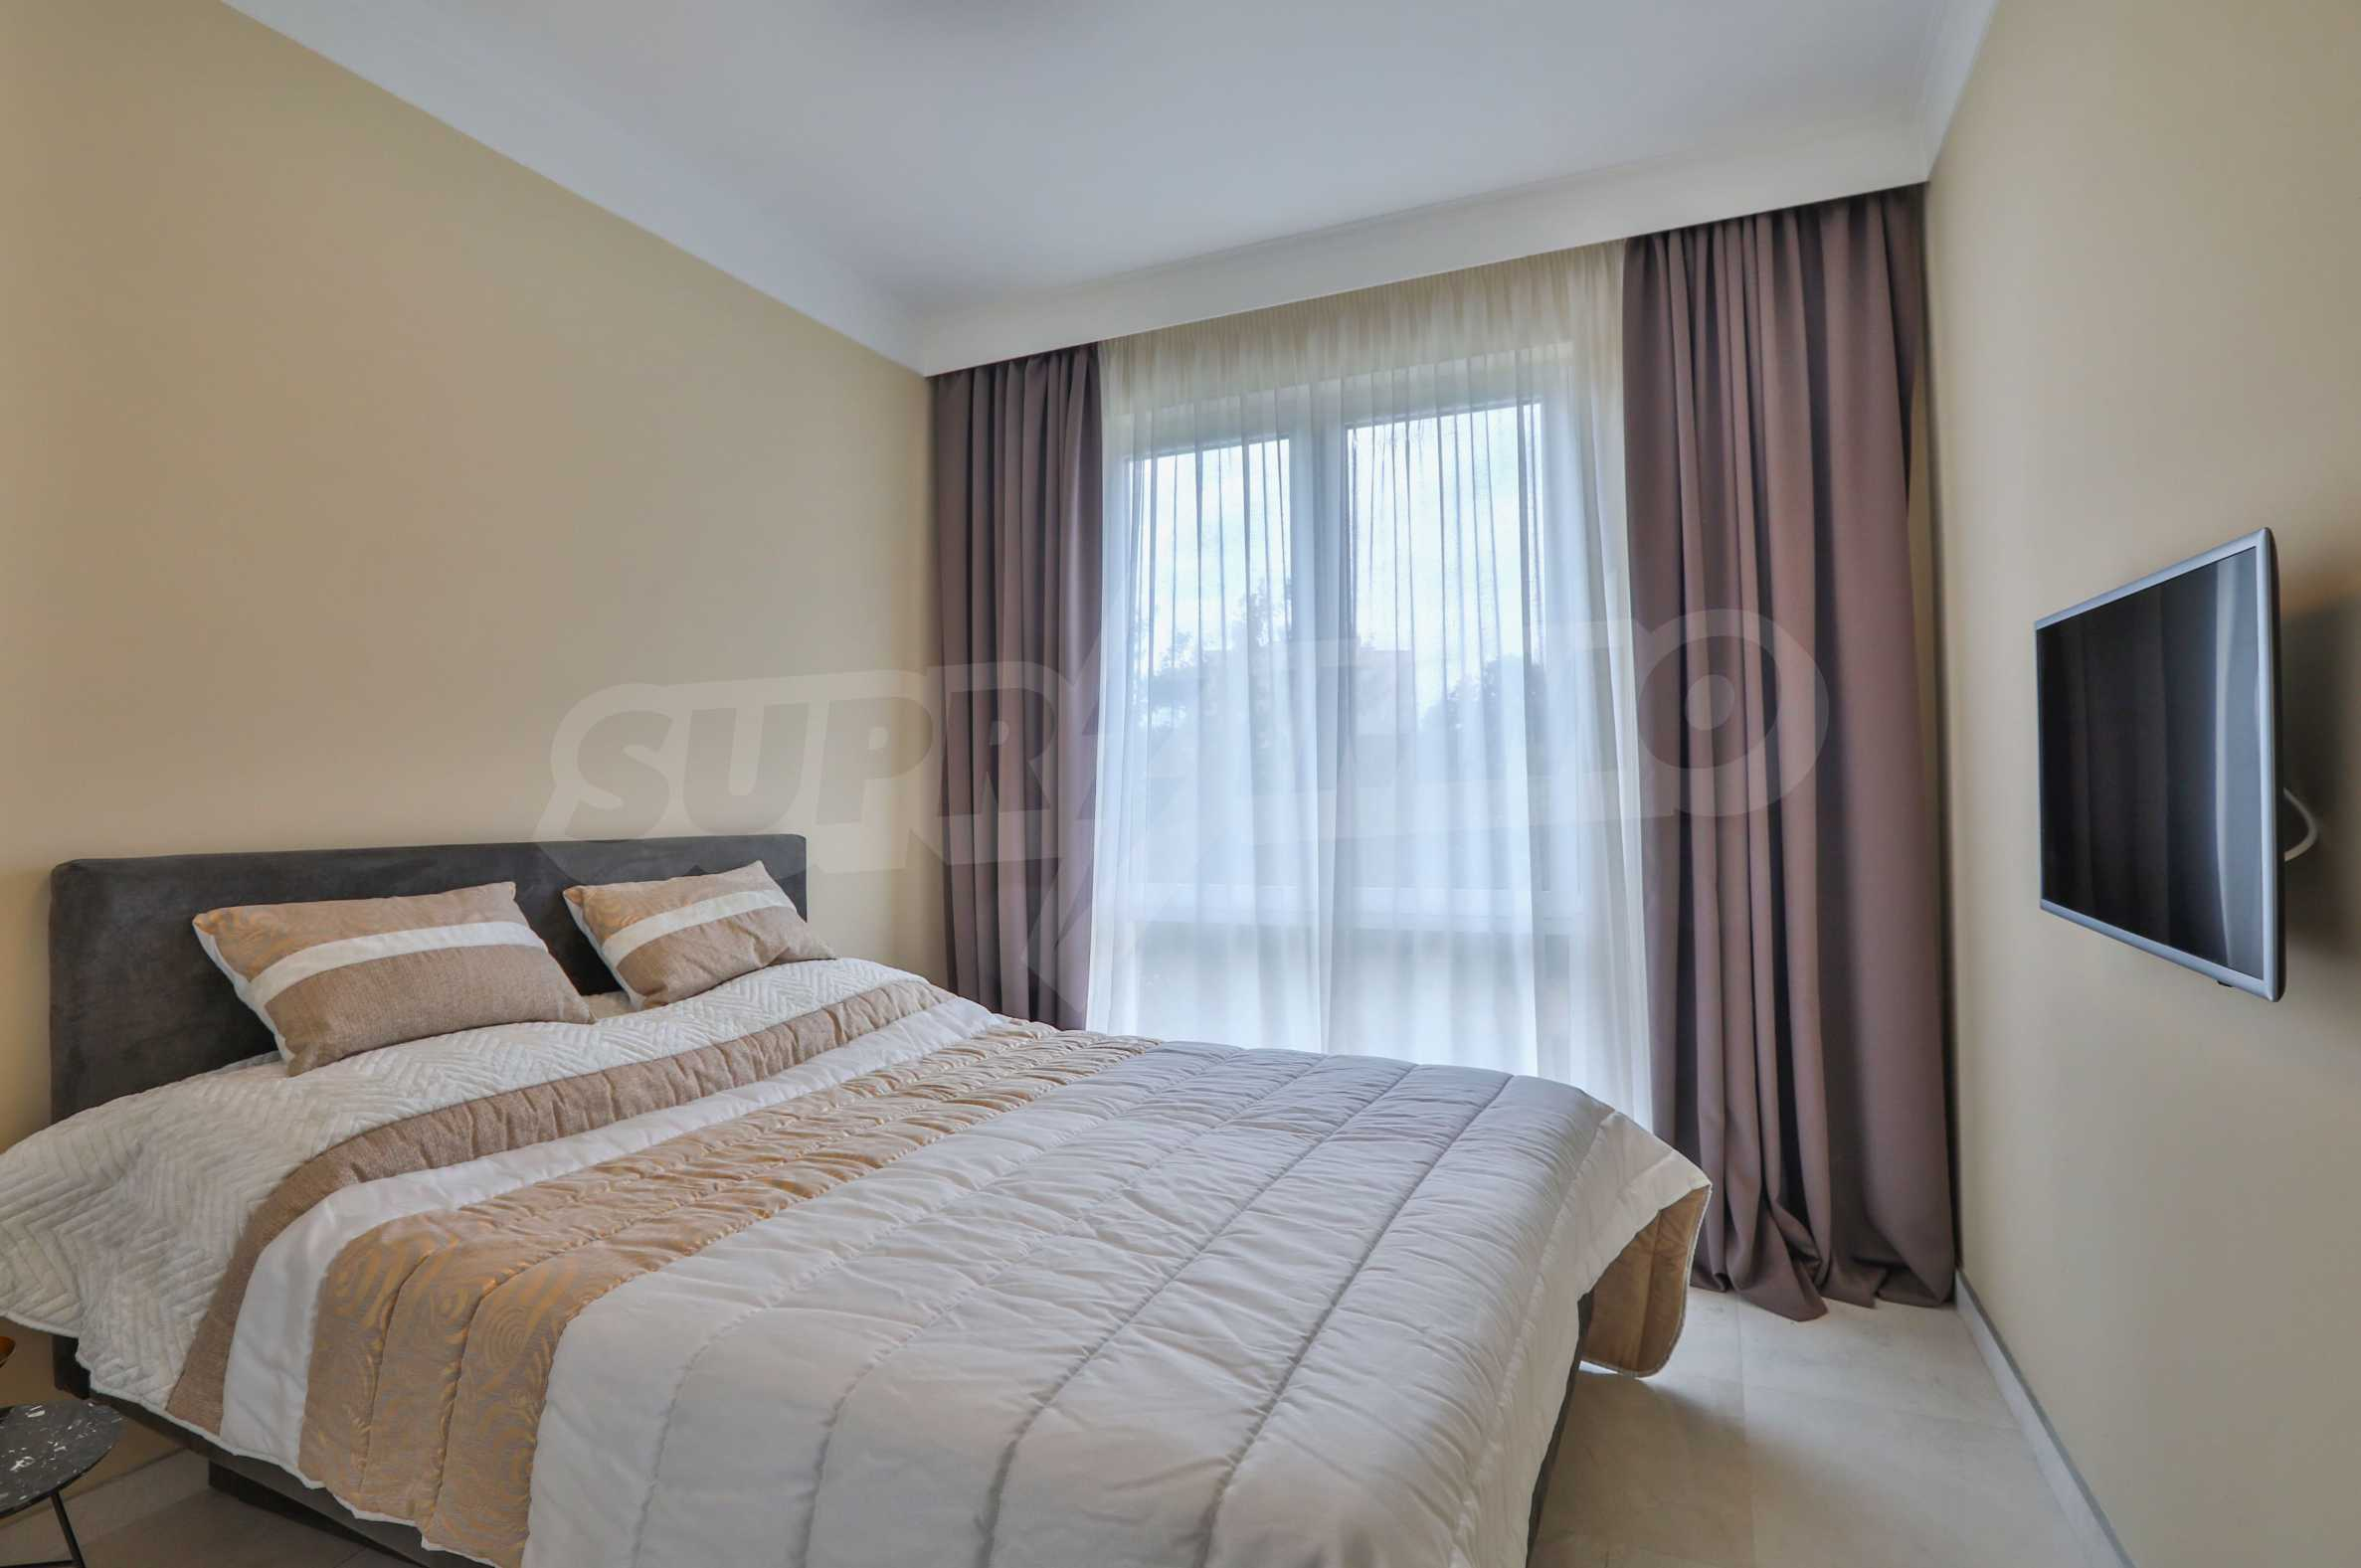 Дизайнерски тристаен апартамент под наем за летен сезон в резиденция Belle Époque в Лозенец 19